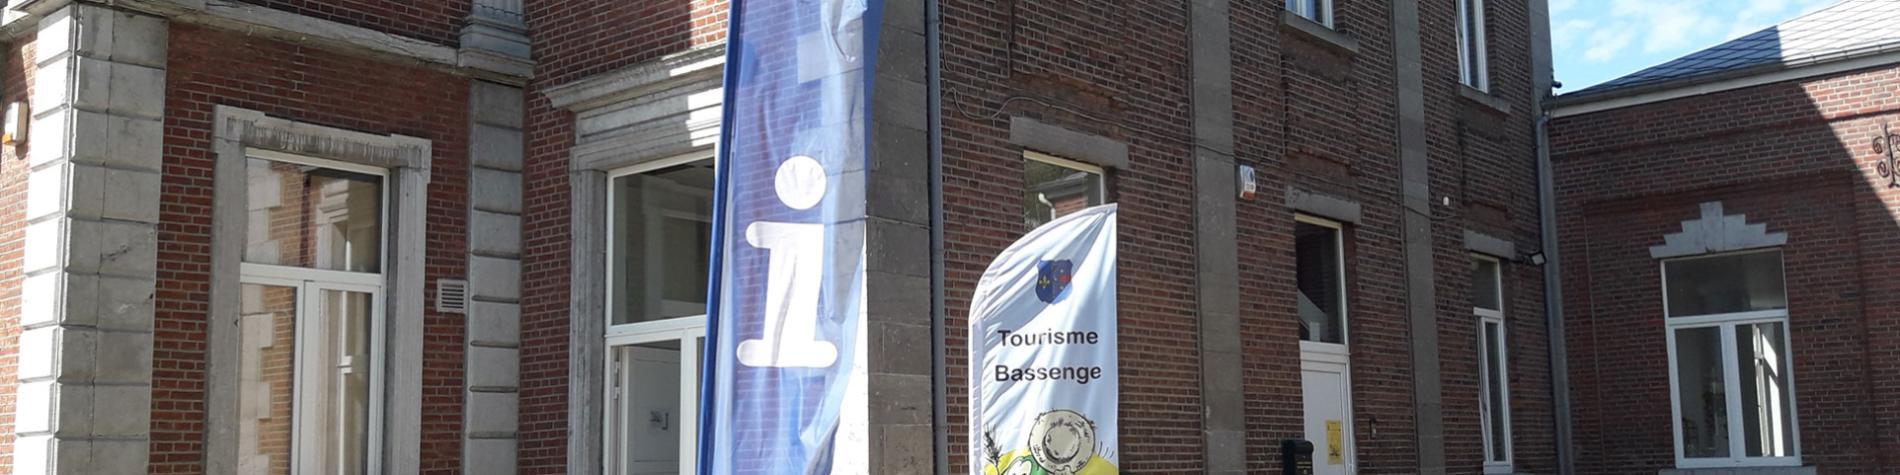 Syndicat d'Initiative - Bassenge - Vallée du Geer